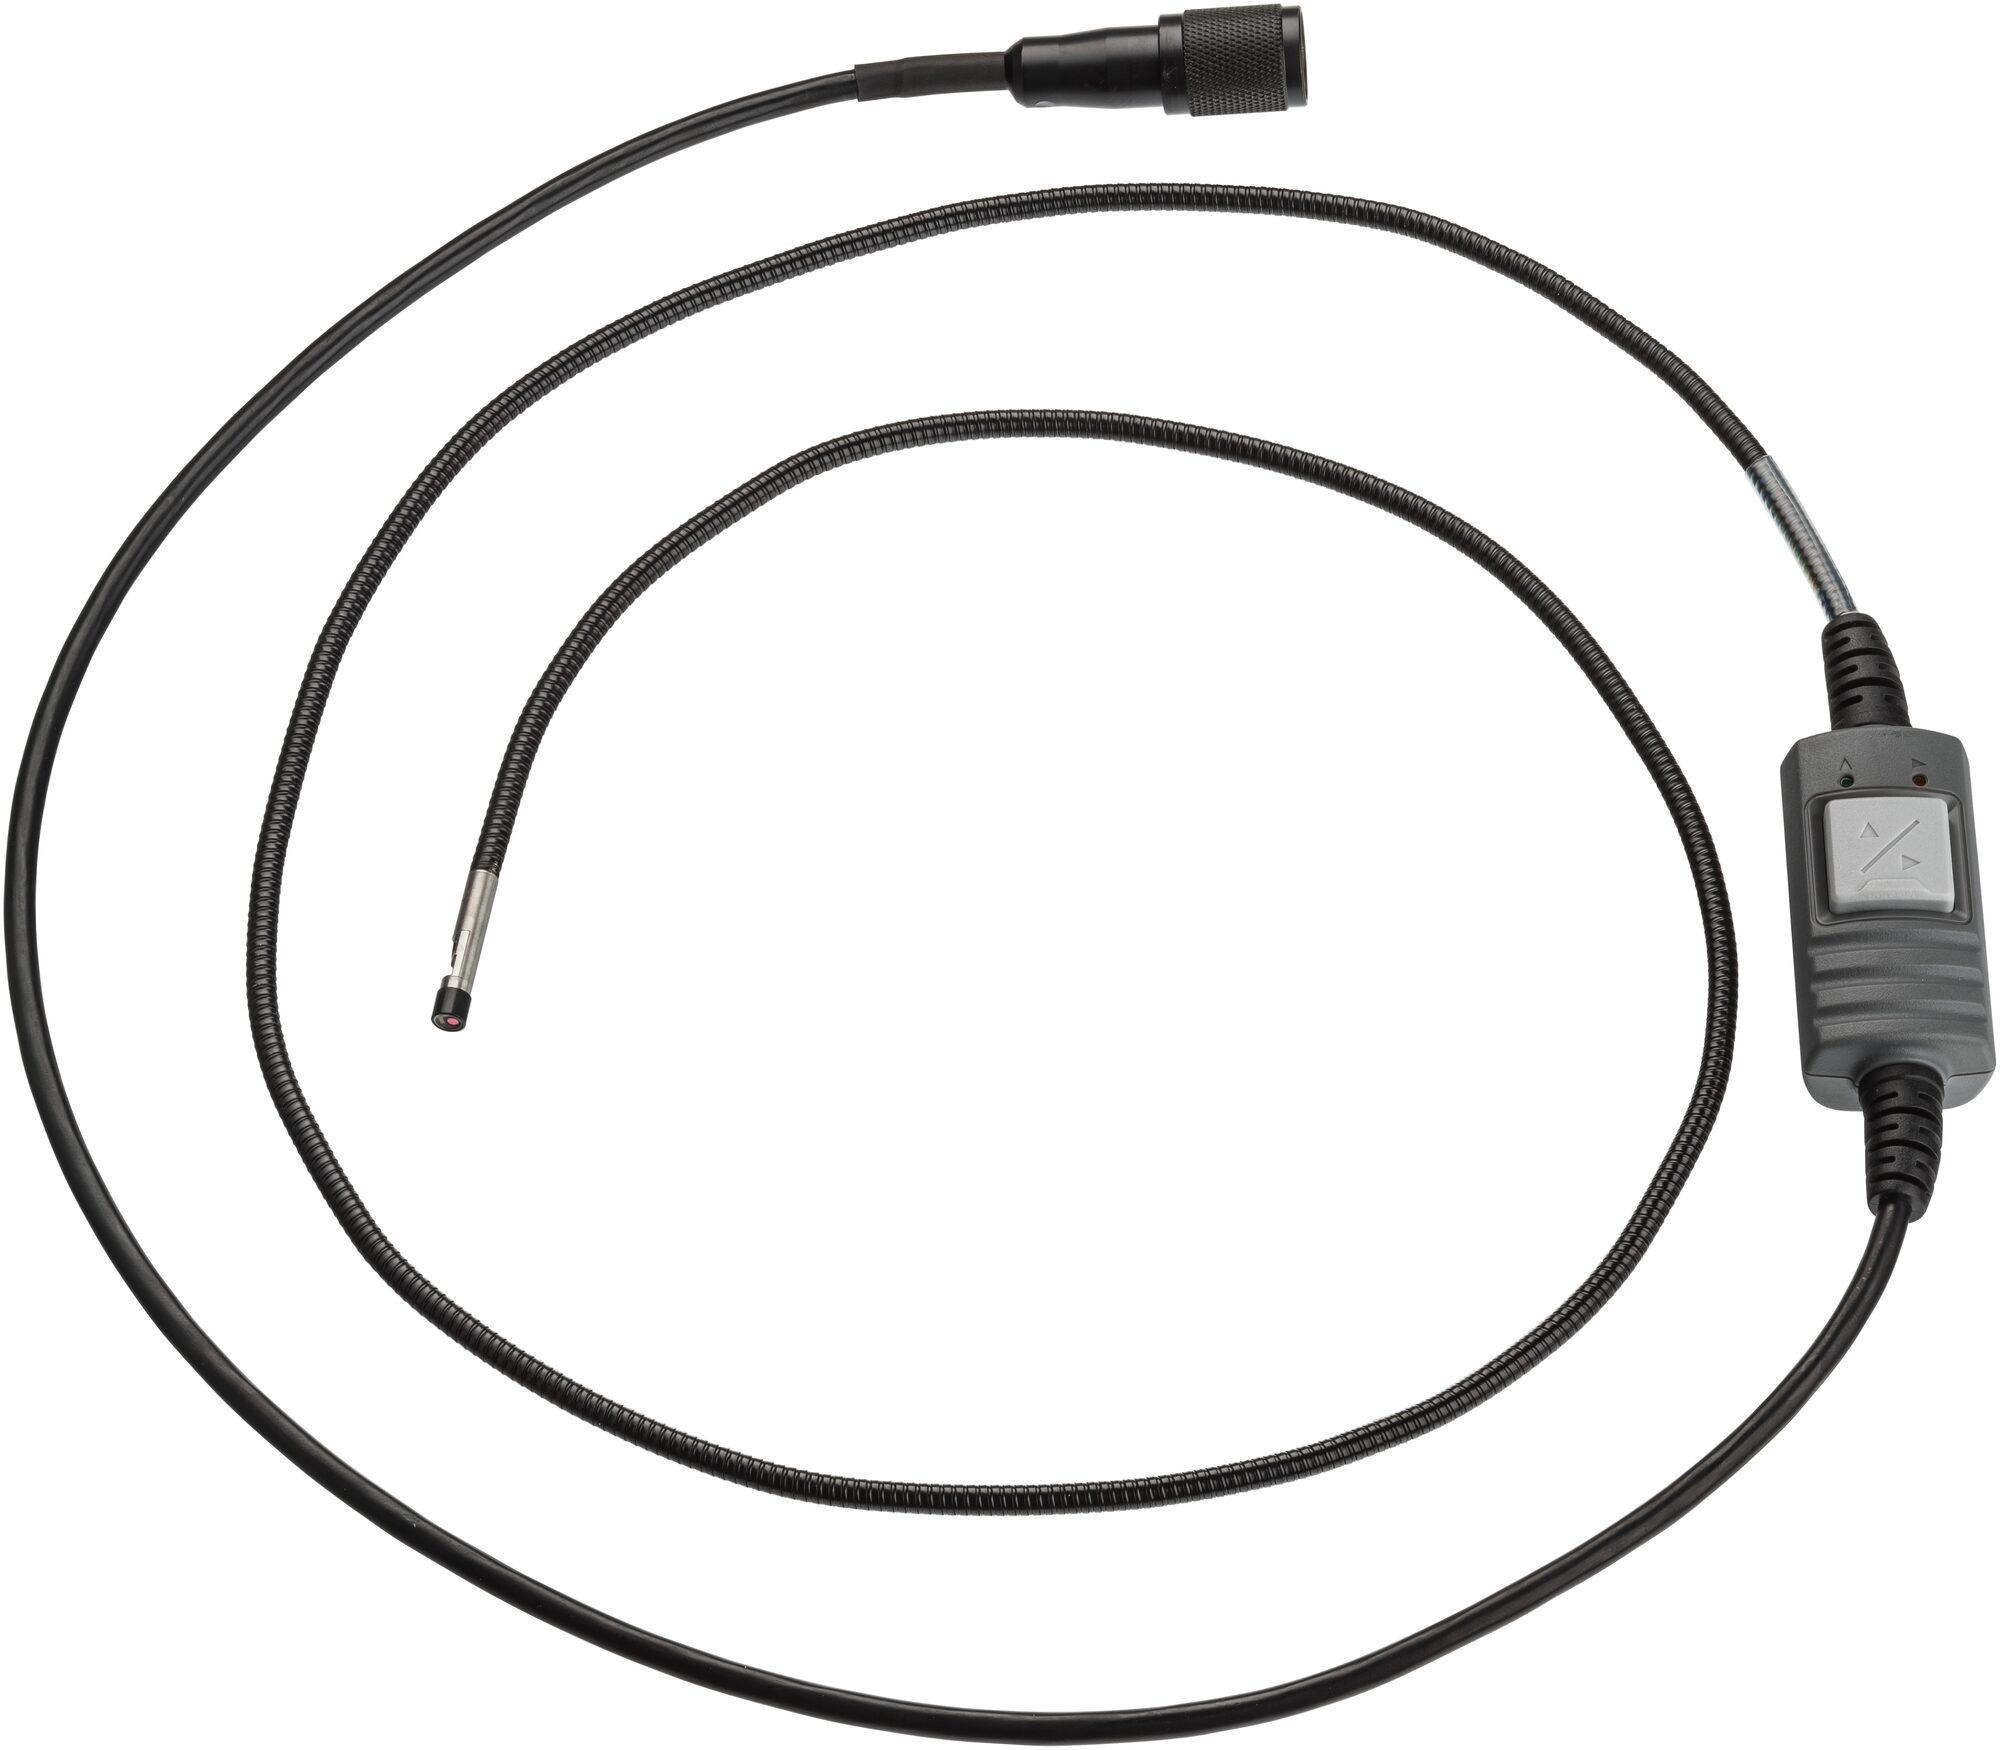 HAZET Video Endoskop Sonde 4812-16 ∙ 4.9 mm